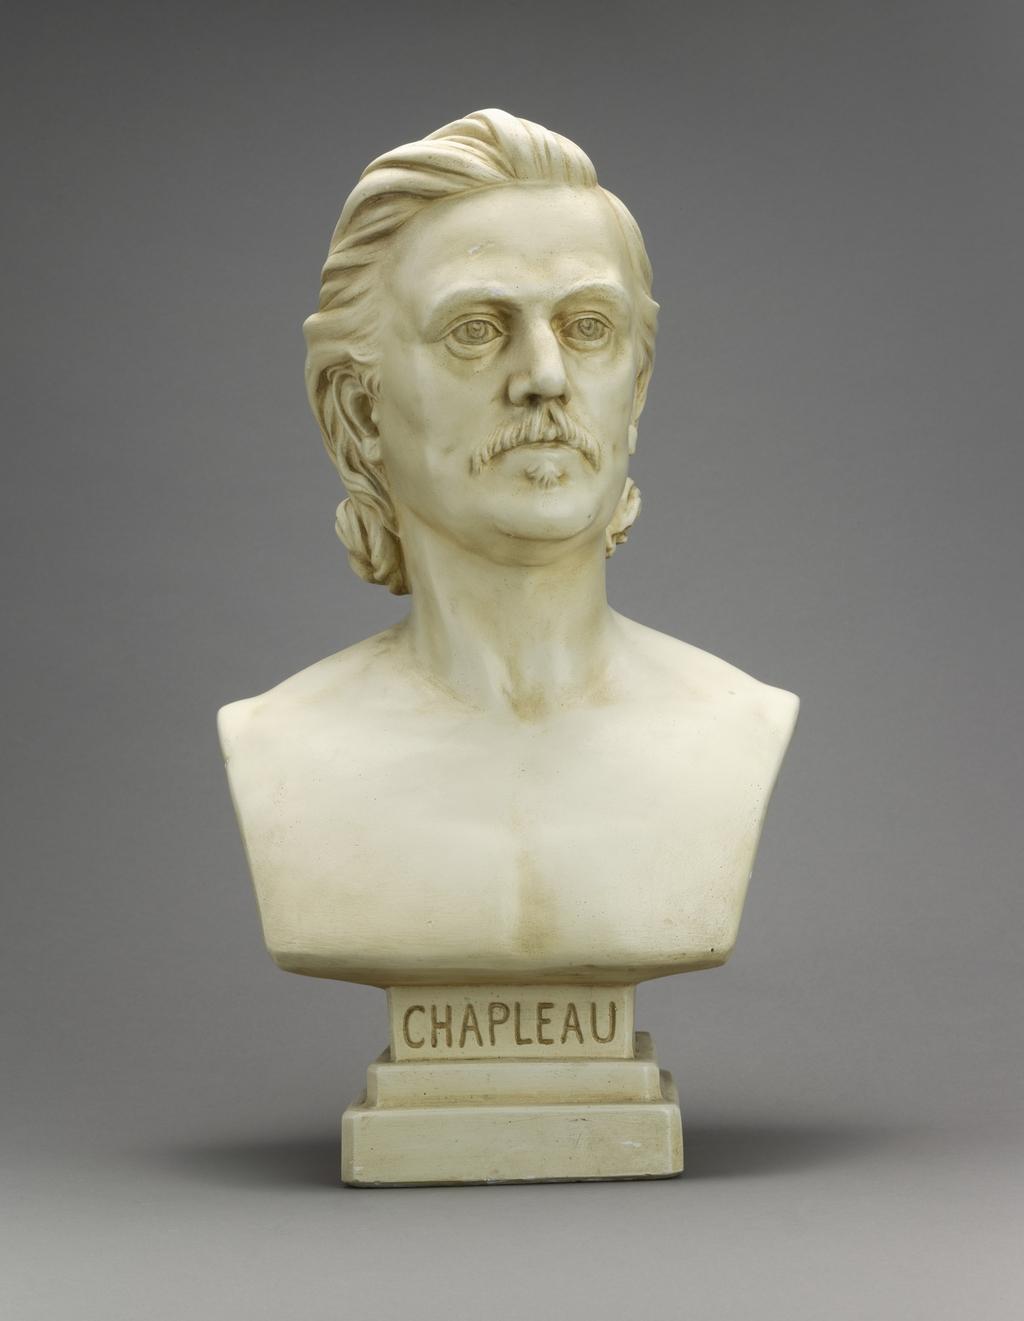 Sir Joseph-Adolphe Chapleau